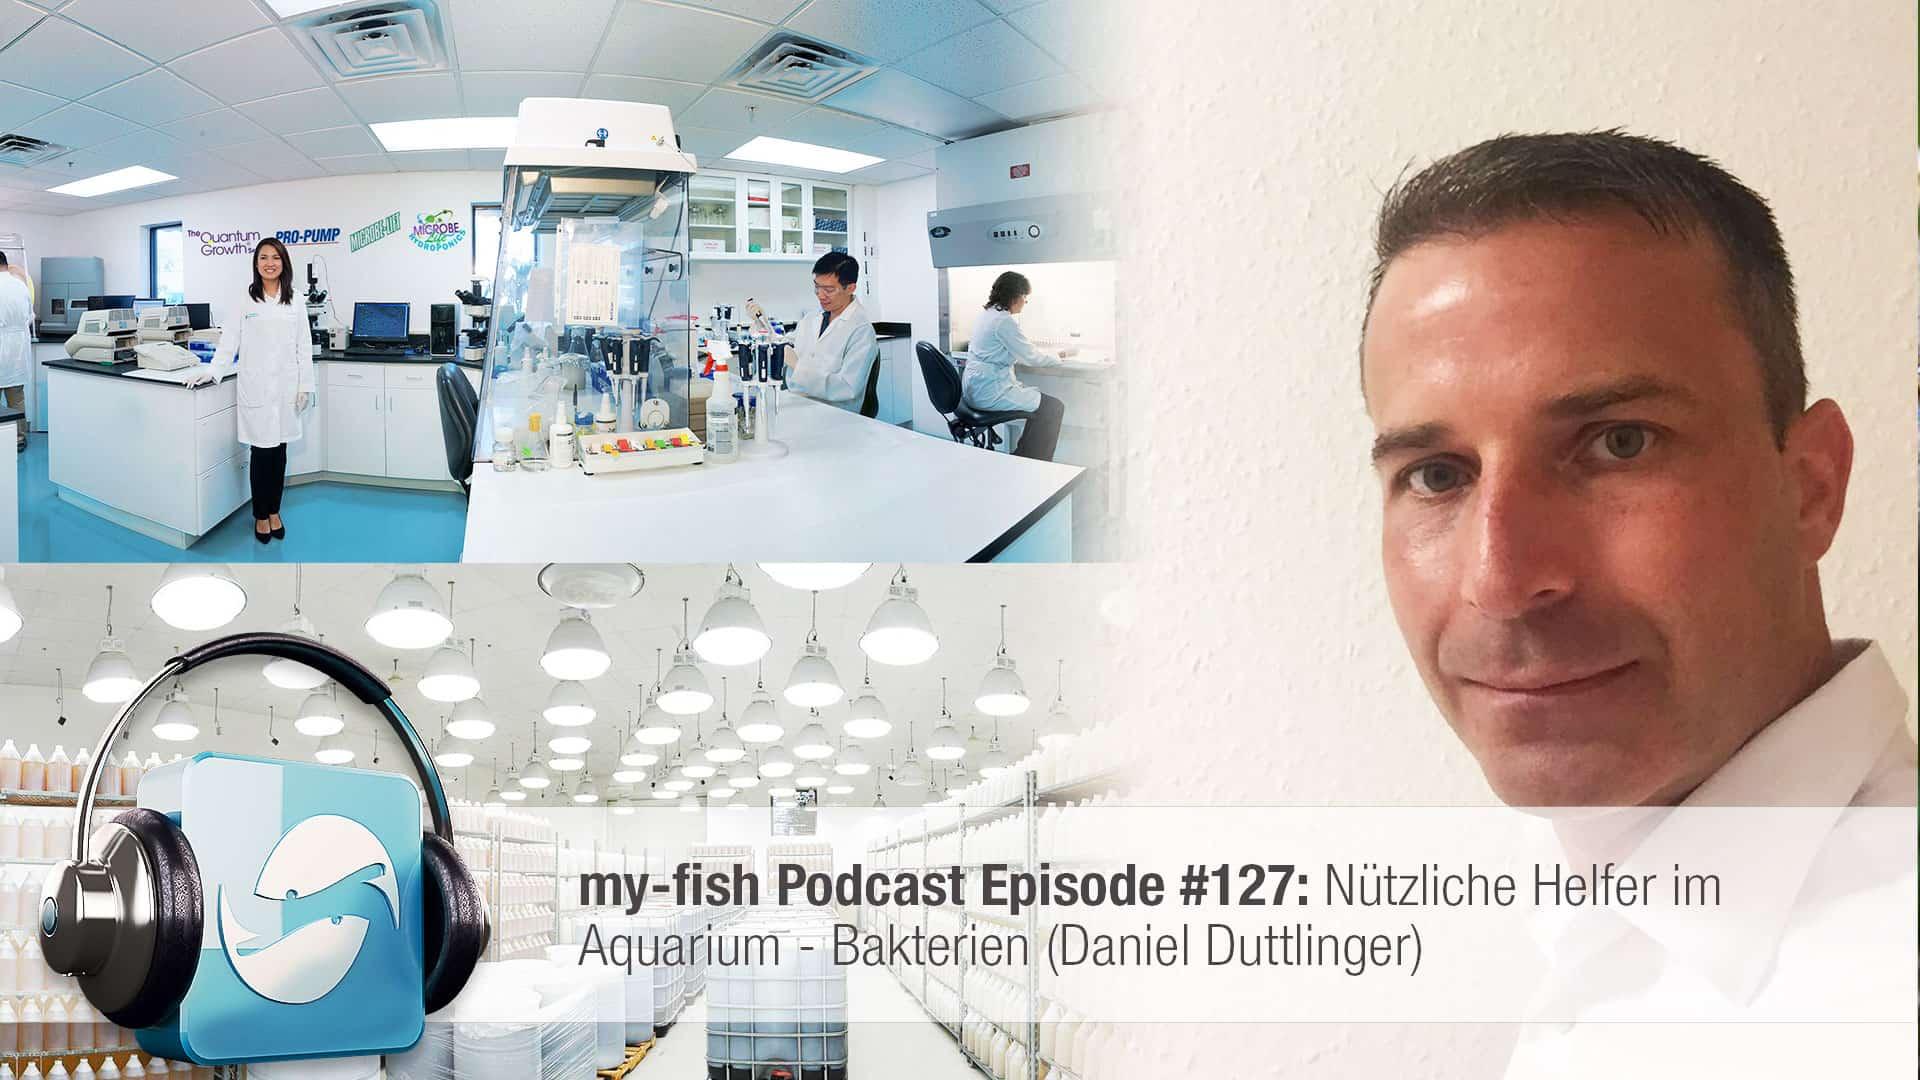 Podcast Episode #127: Nützliche Helfer im Aquarium - Bakterien (Daniel Duttlinger) 1